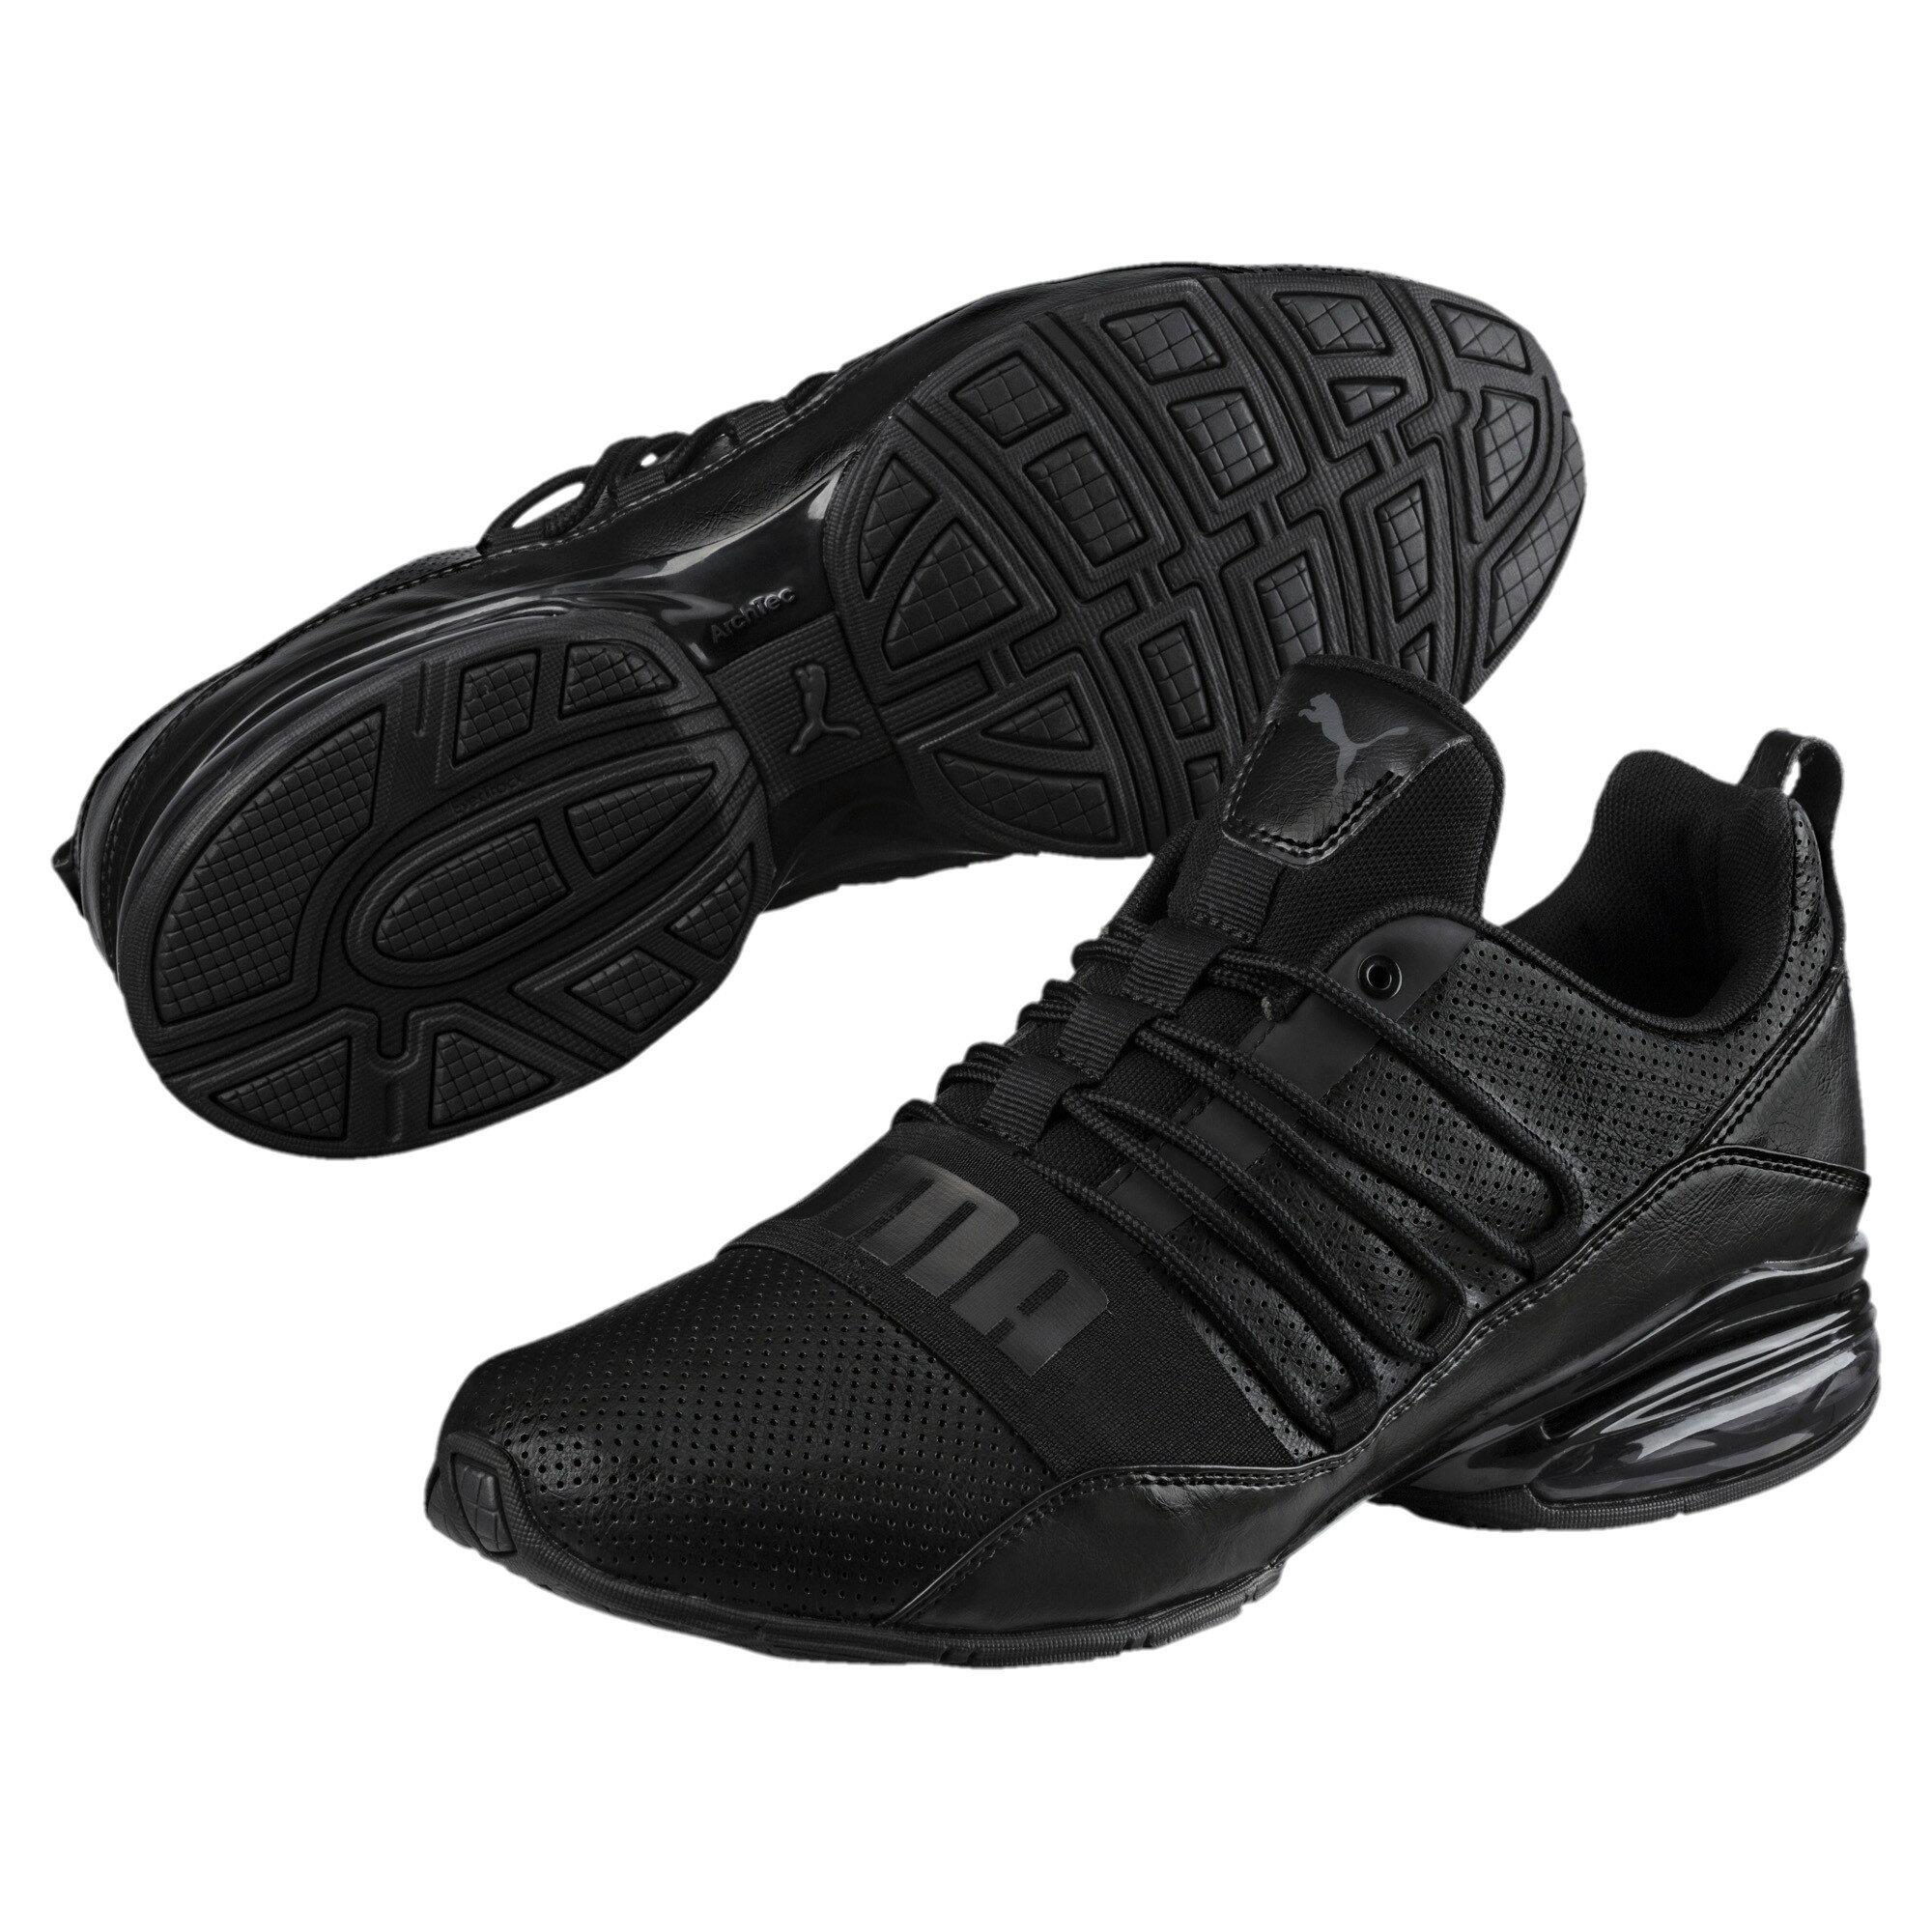 b239d0827c2c Official Puma Store  PUMA Cell Pro Limit Men s Running Shoes ...